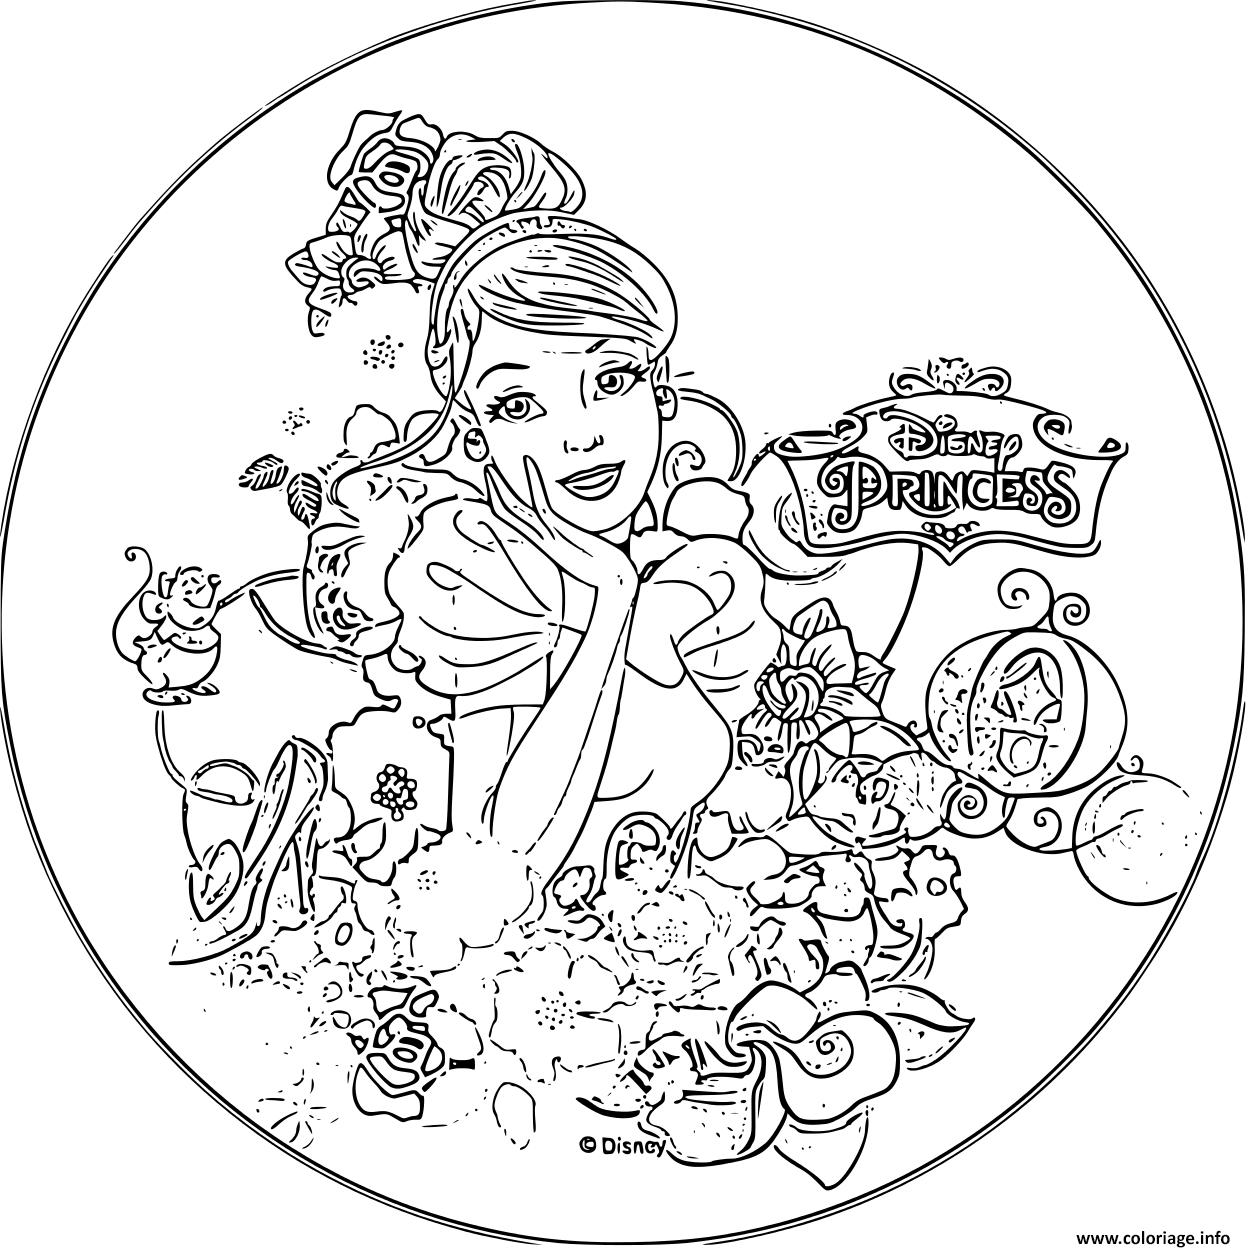 Coloriage Disney Princesse Cendrillon 1950 Dessin tout Cendrillon À Colorier